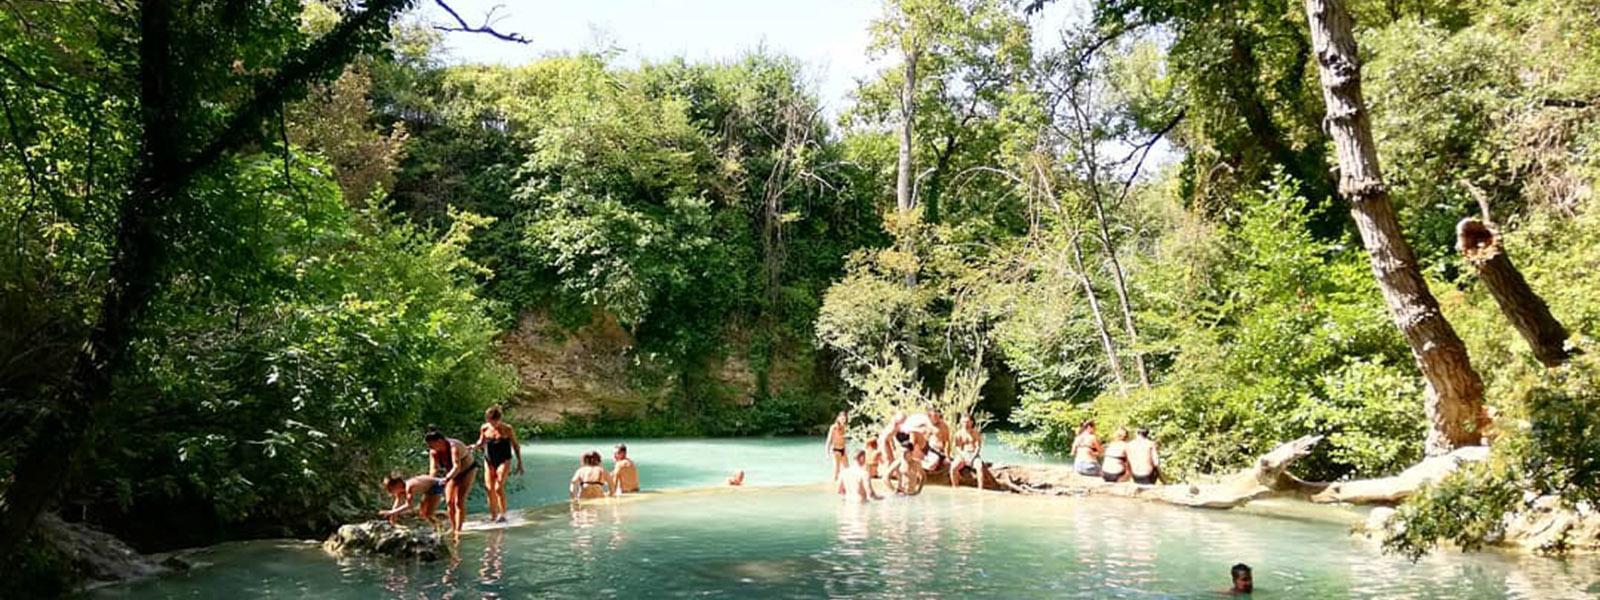 bagnanti parco fluviale dell elsa sentierelsa visit colle di val d elsa borgo medievale toscana